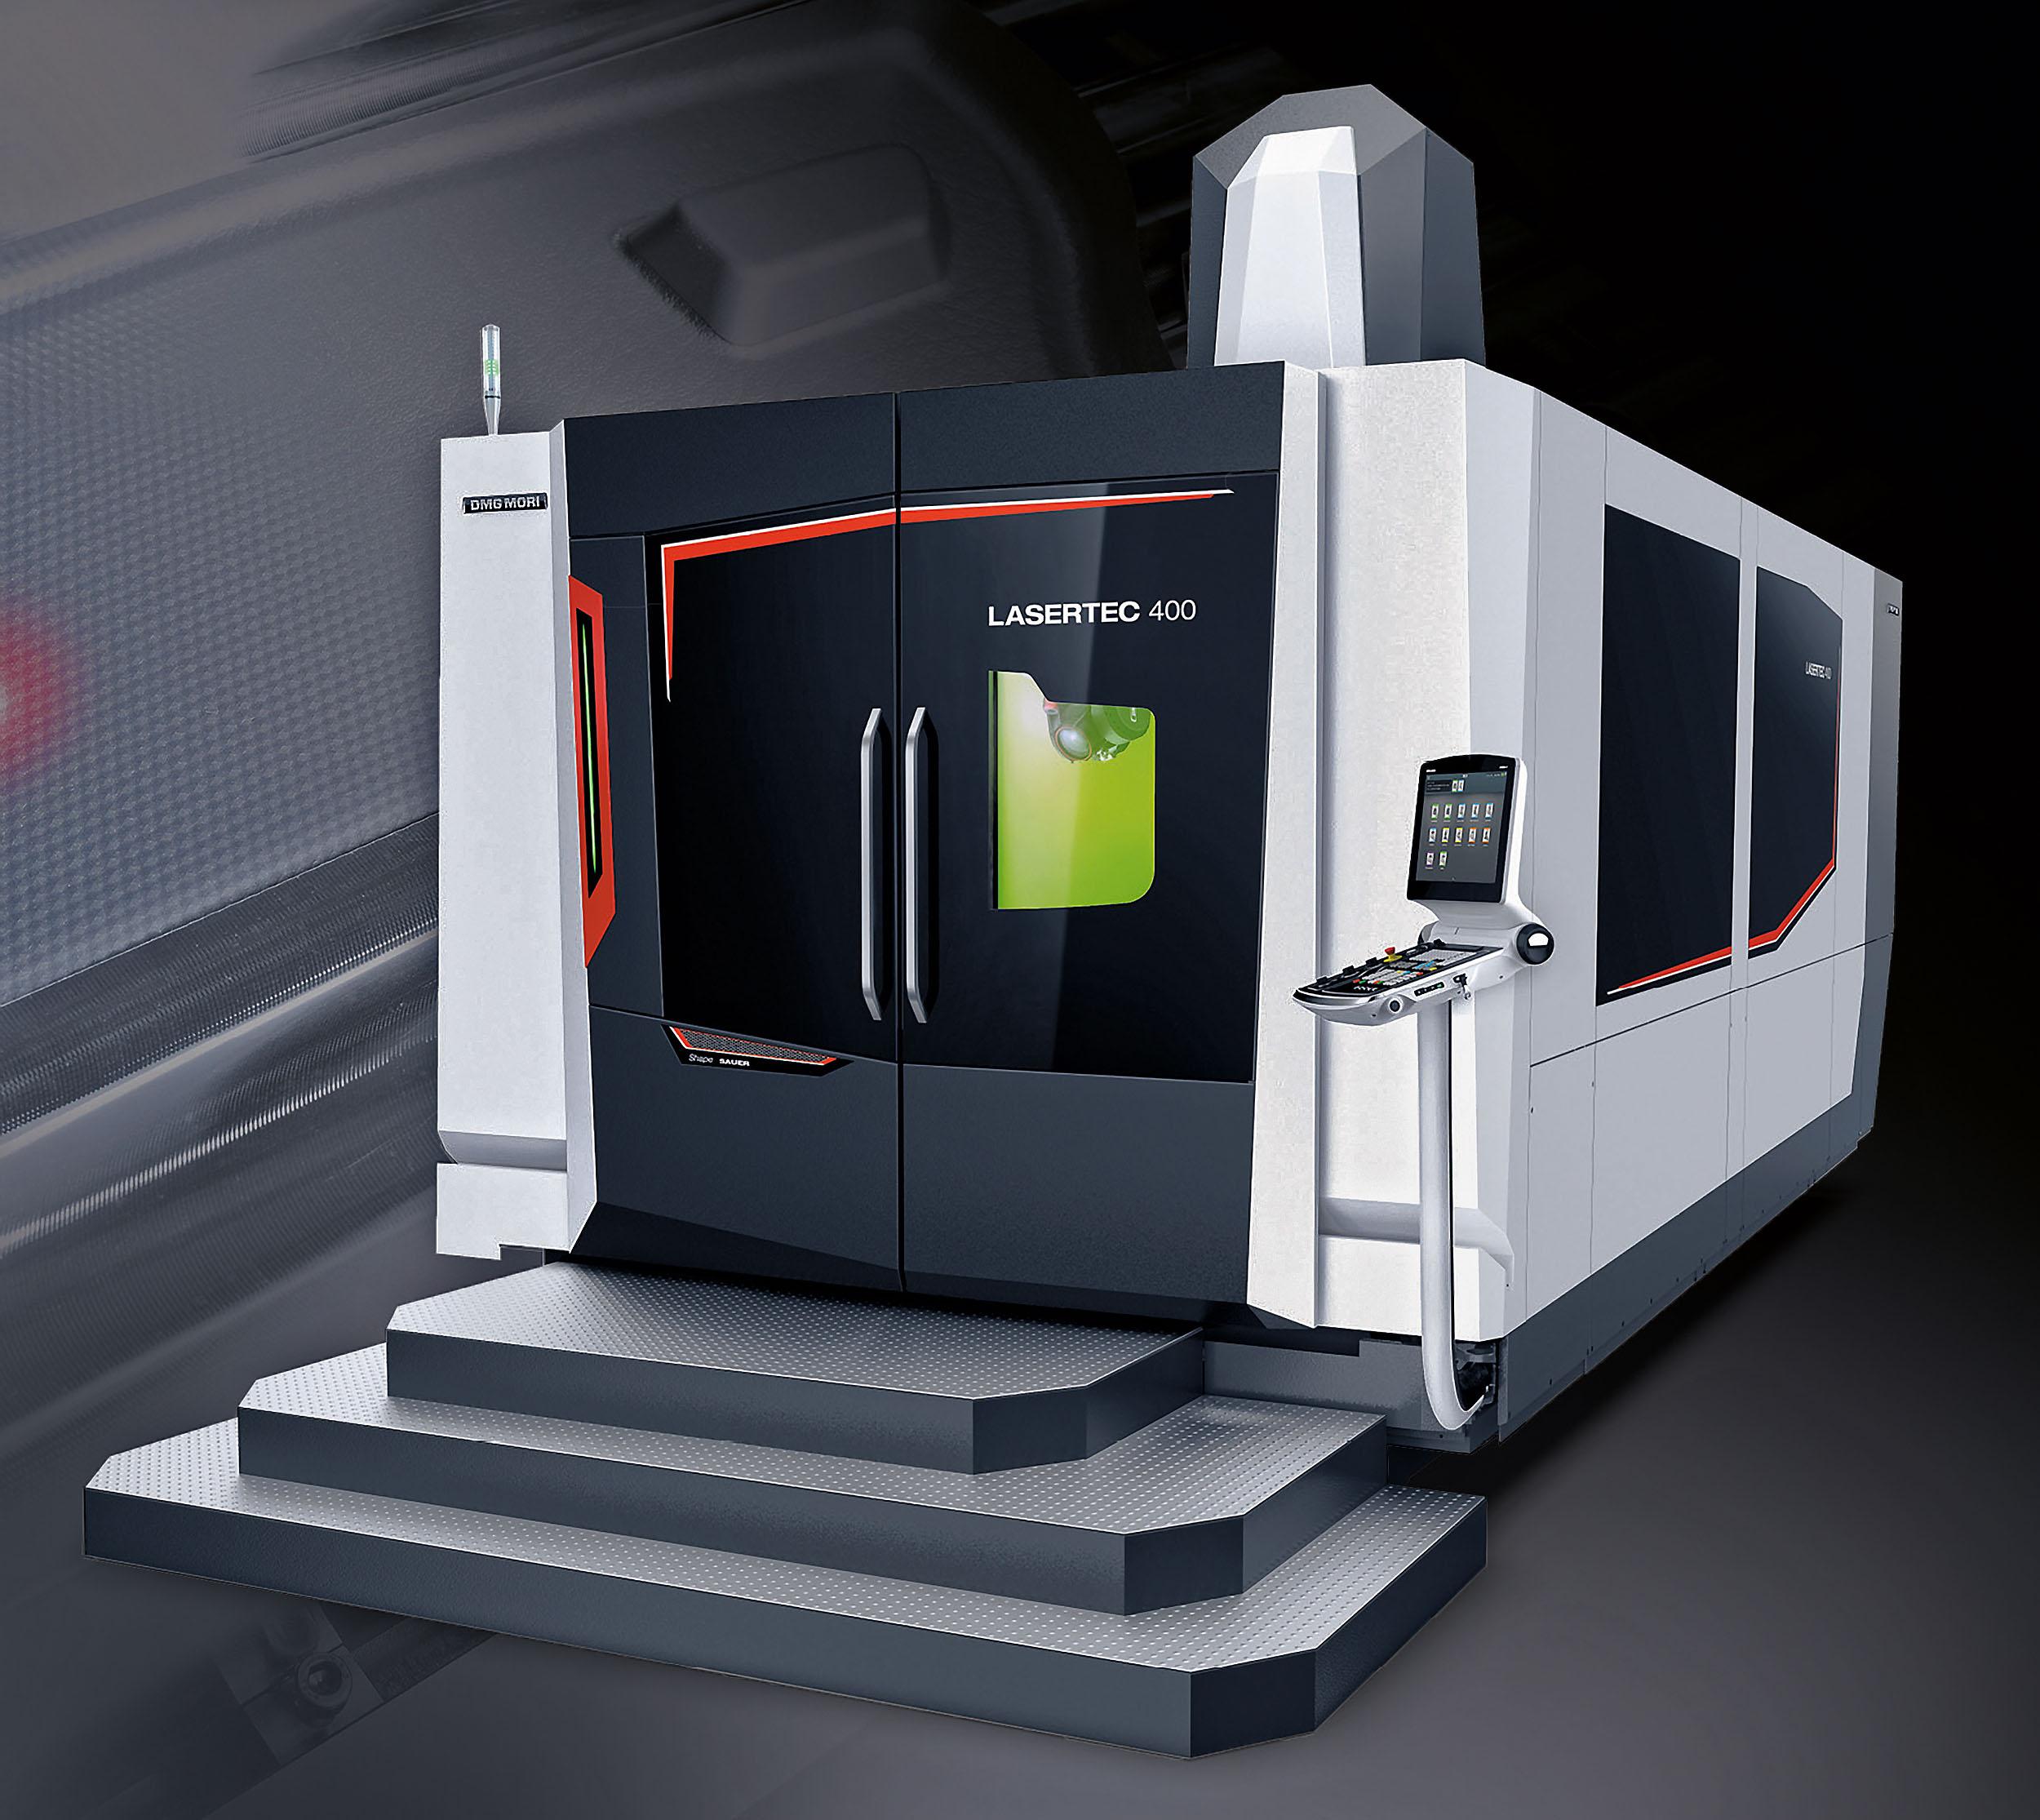 3D Printing Business Information Sliced: Sonda SYS, Sintratec, Nanofabrica, DMG MORI, RPS, PostProcess